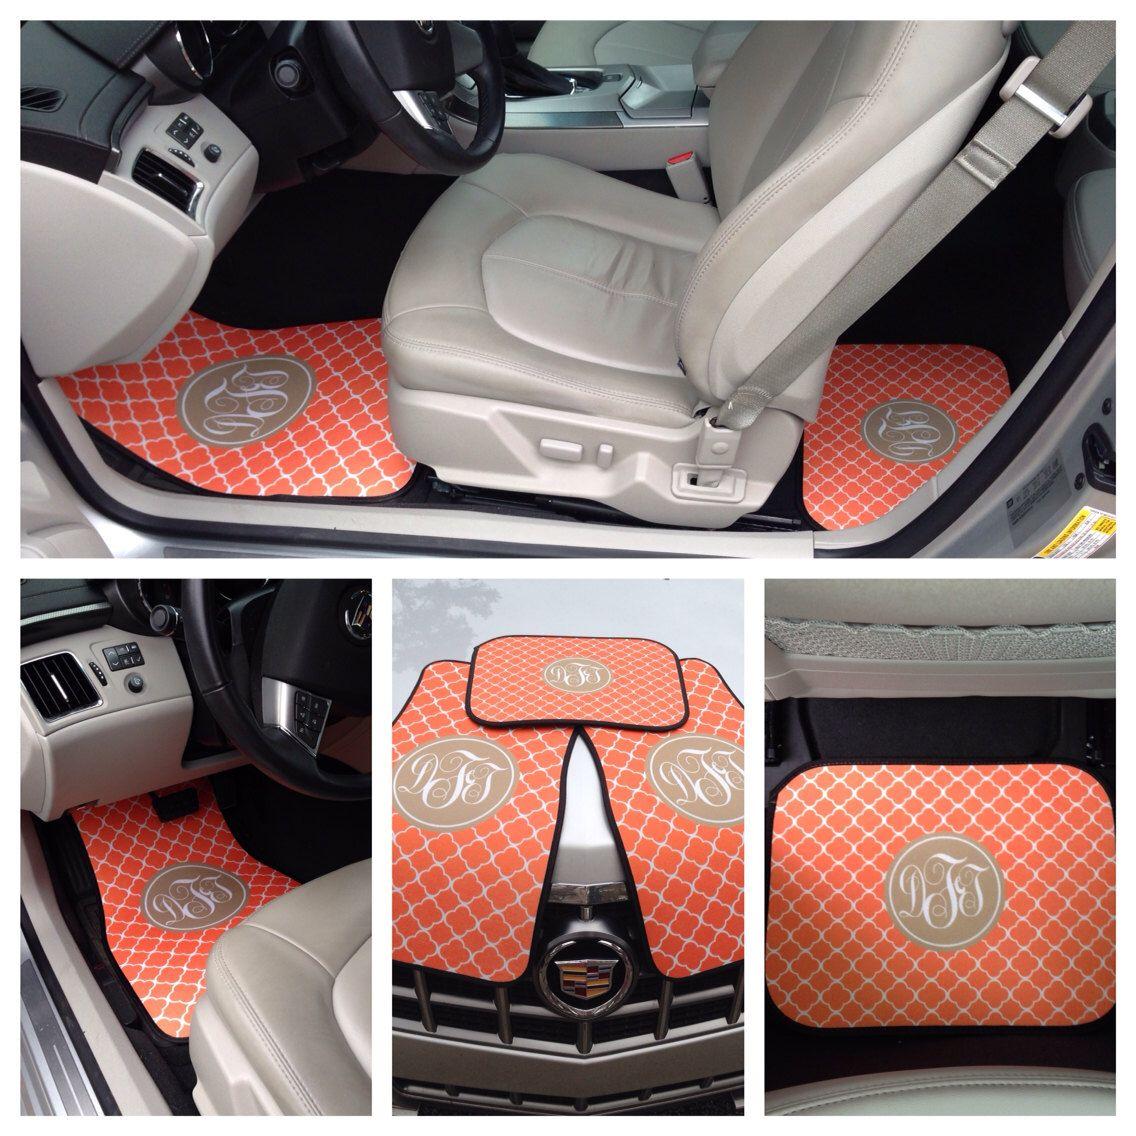 Monogrammed Car Floor Mats, Monogrammed Car Accessories for Women ...